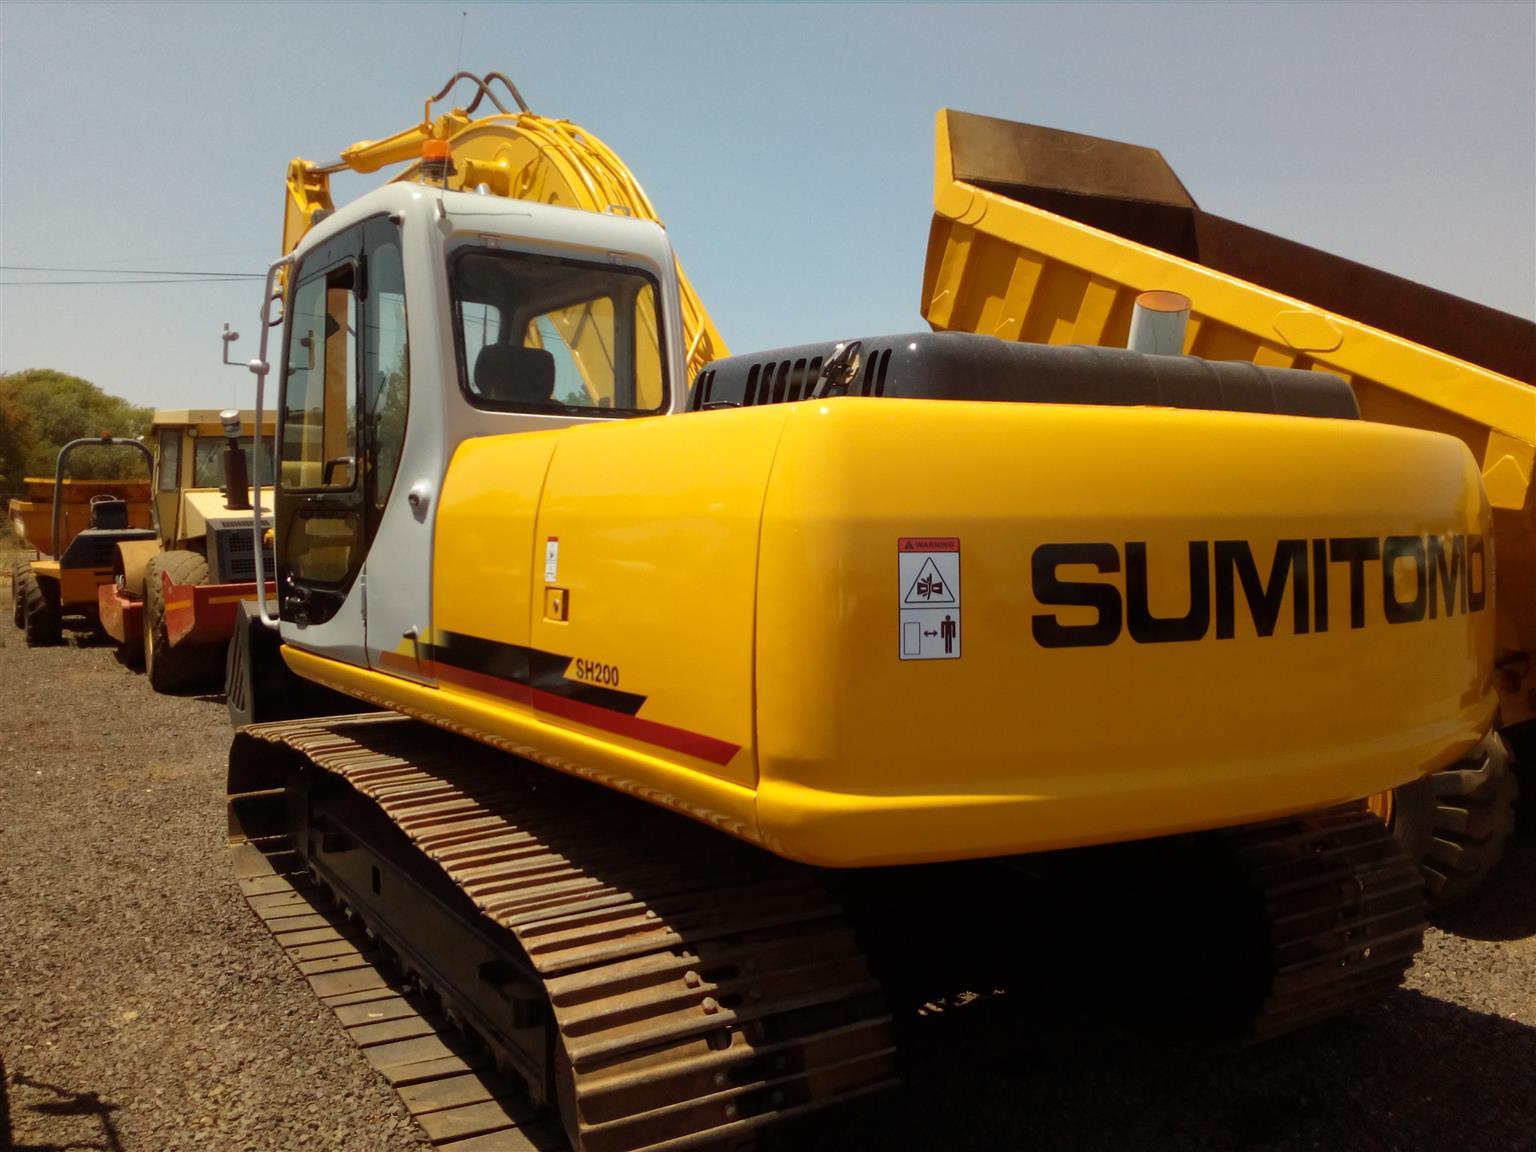 Sumitomo SH200 20 Ton Excavator